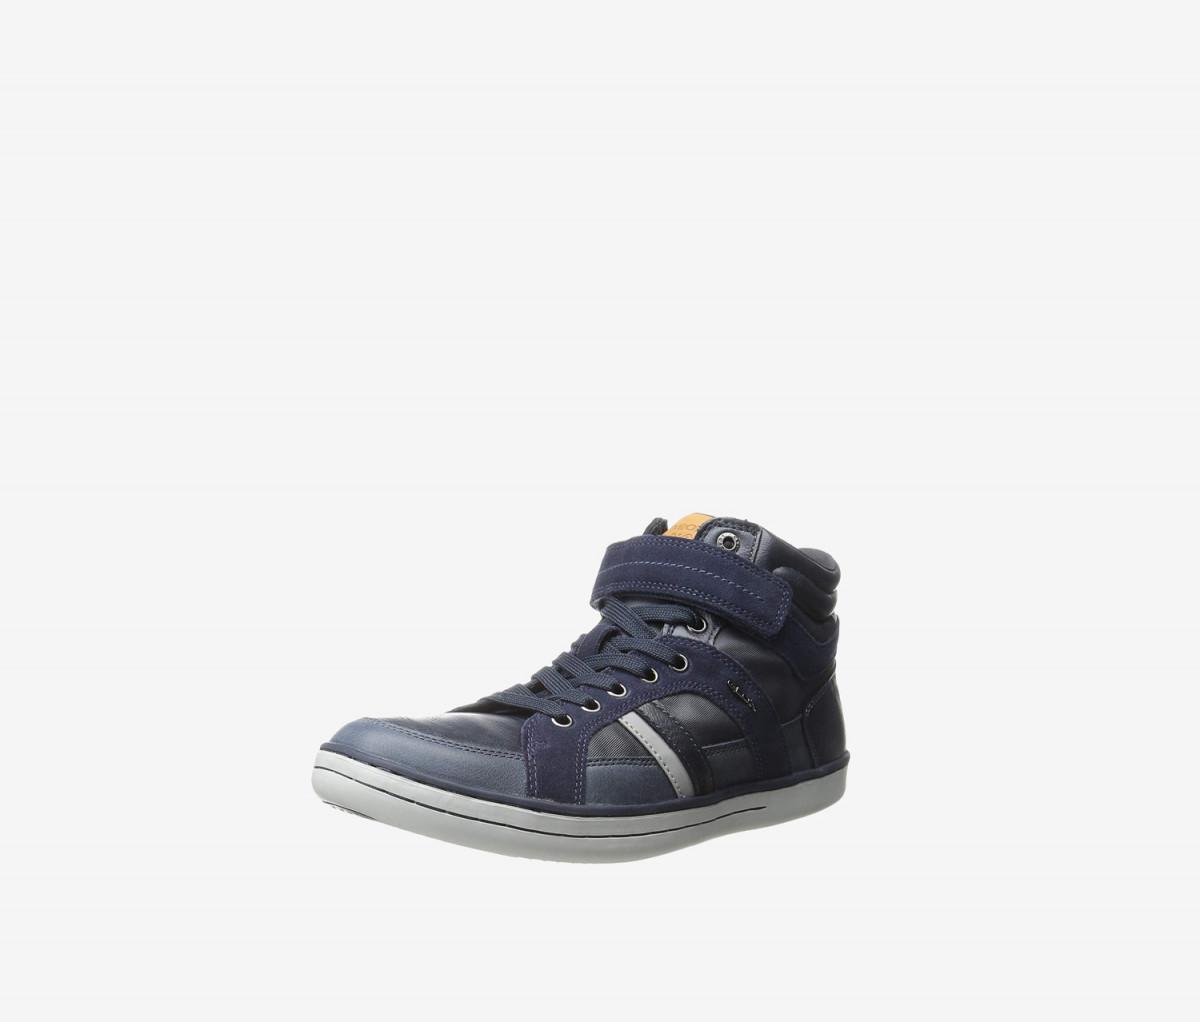 Geox Respira Boys J Garcia Shoes  Navy/Gray